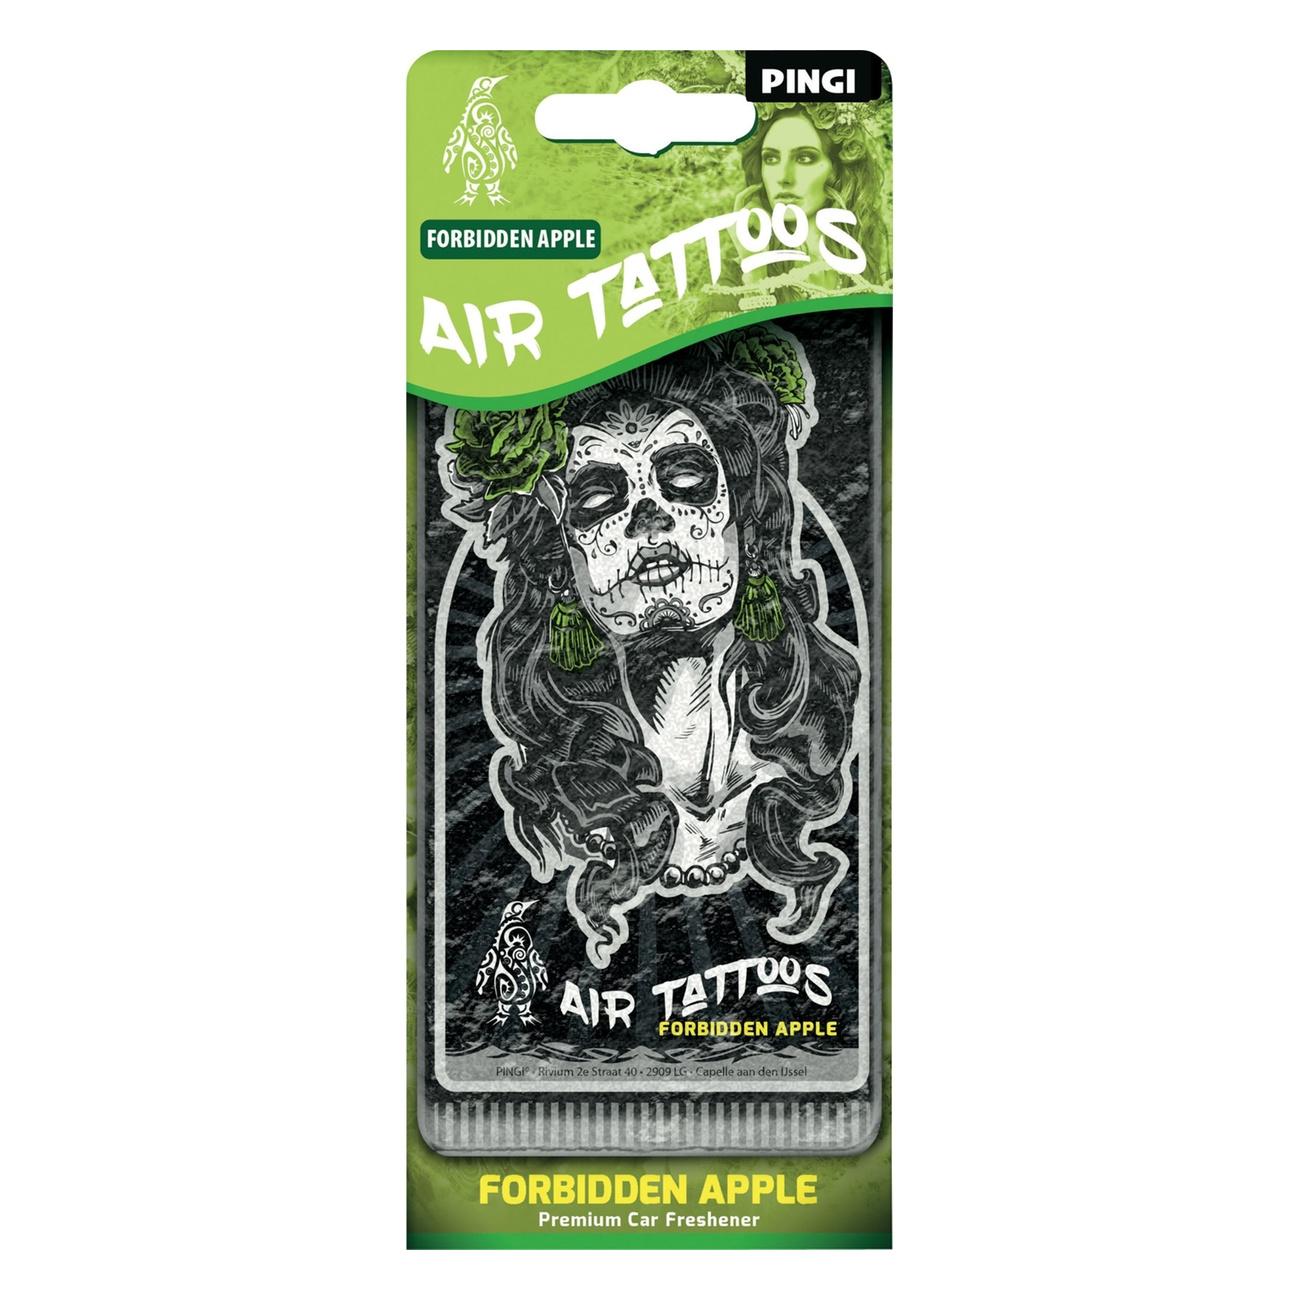 PINGI Air Tattoos, Forbidden Apple